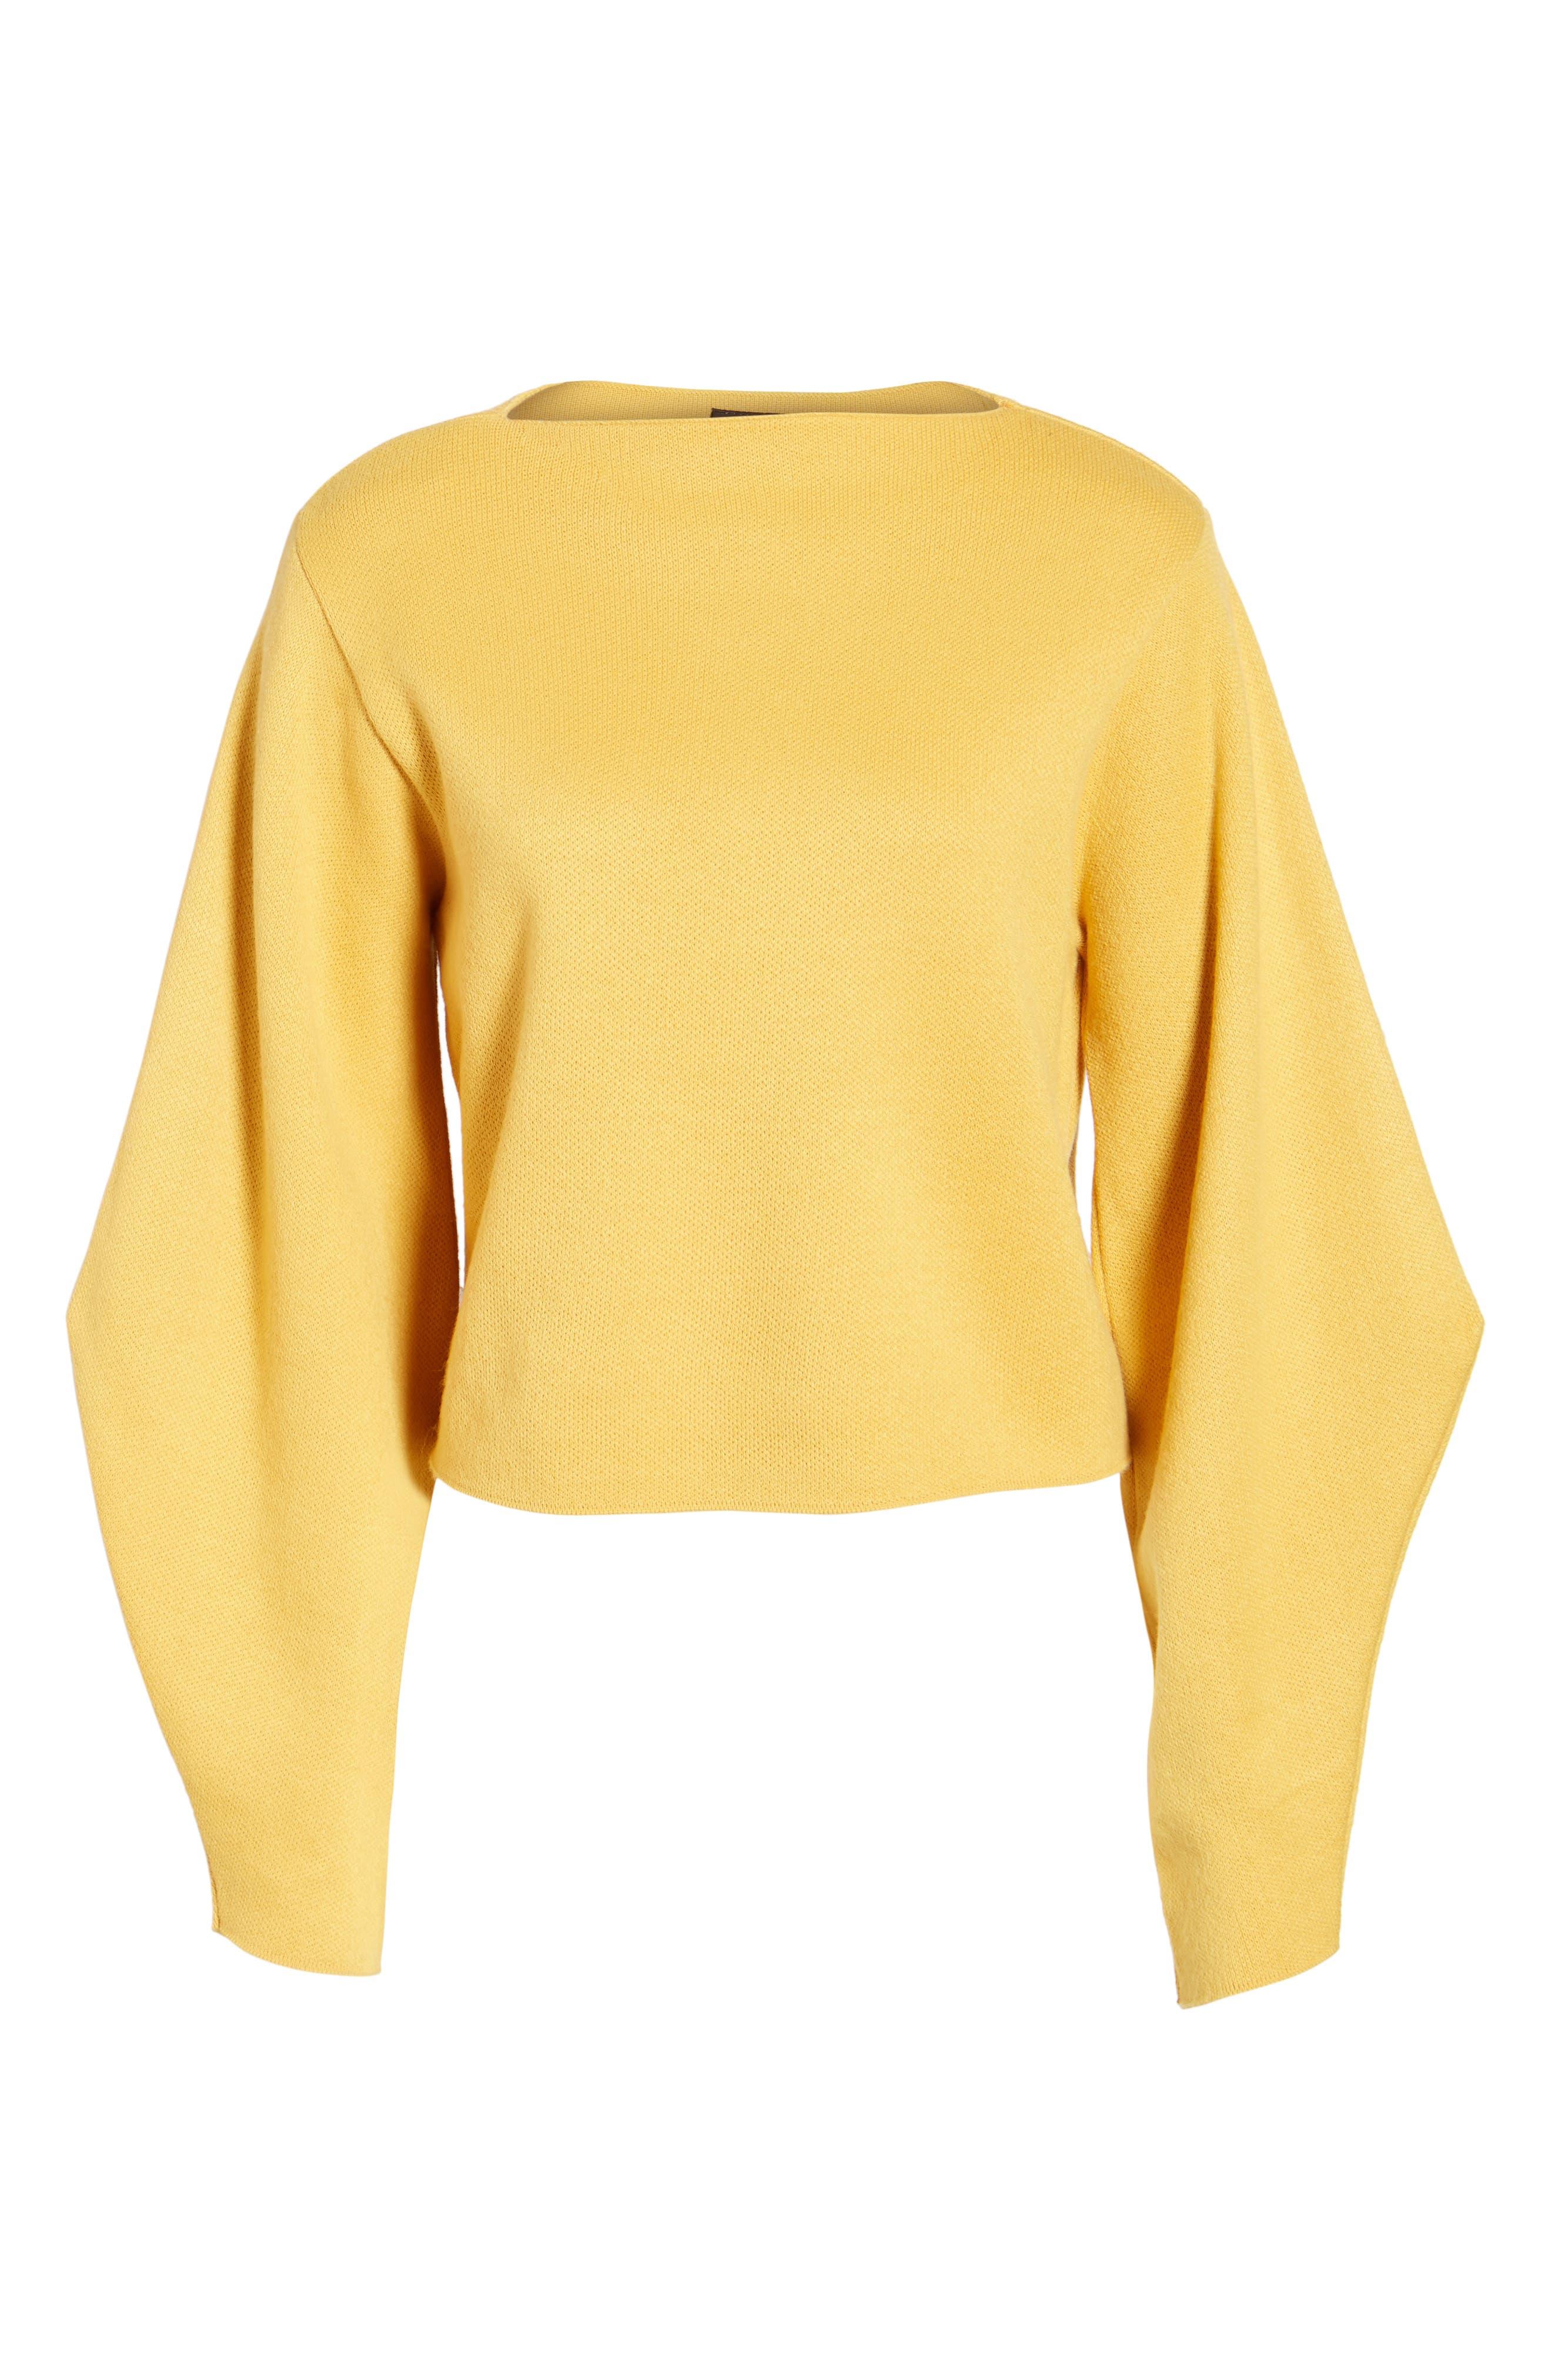 Balloon Sleeve Sweater,                             Alternate thumbnail 6, color,                             700